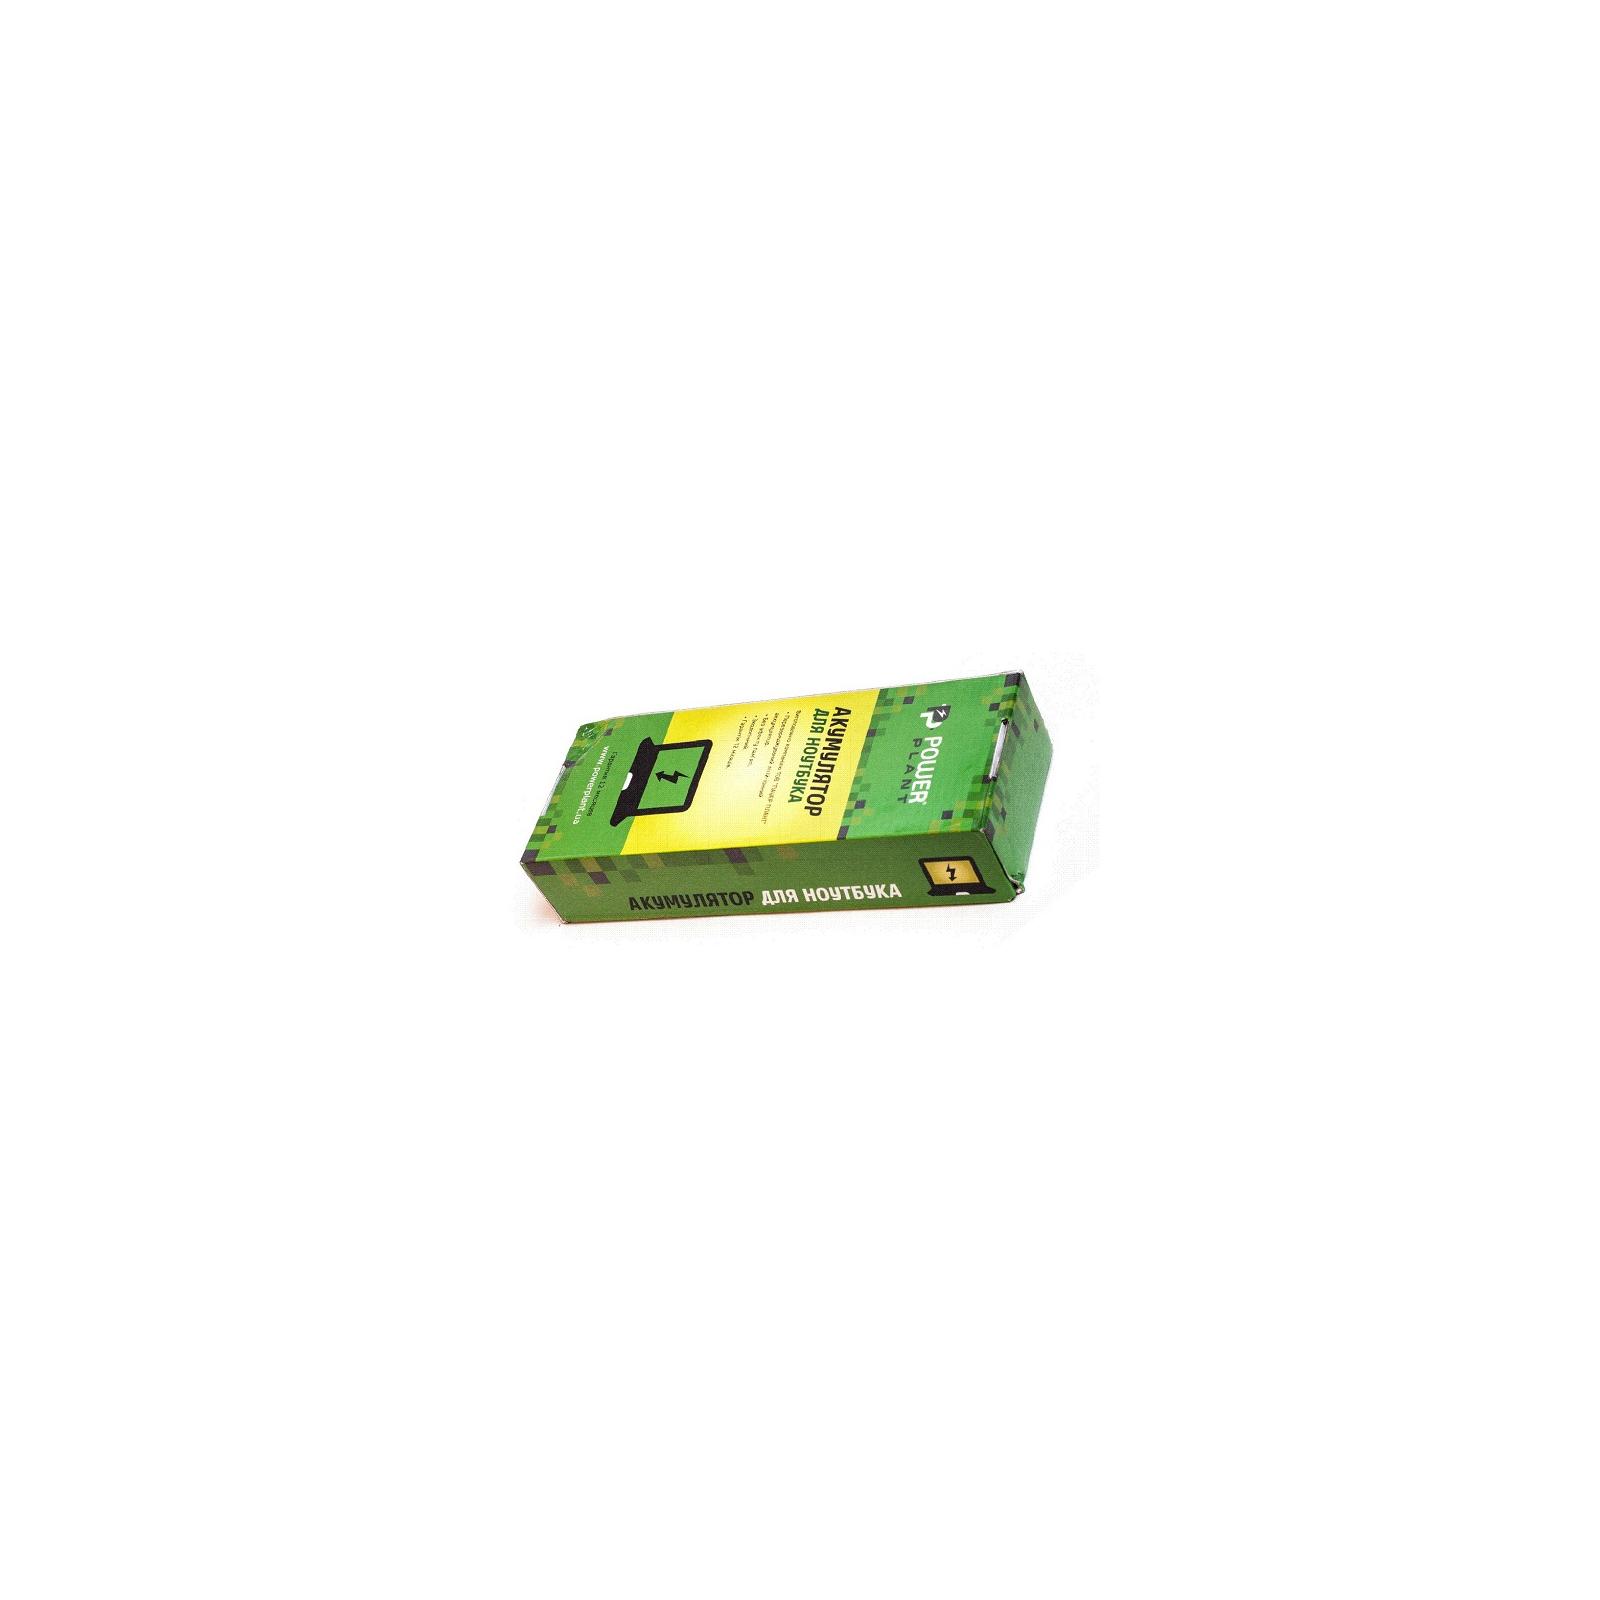 Аккумулятор для ноутбука DELL Inspiron 6400 (KD476, DL6402LH) 11.1V 5200mAh PowerPlant (NB00000110) изображение 3